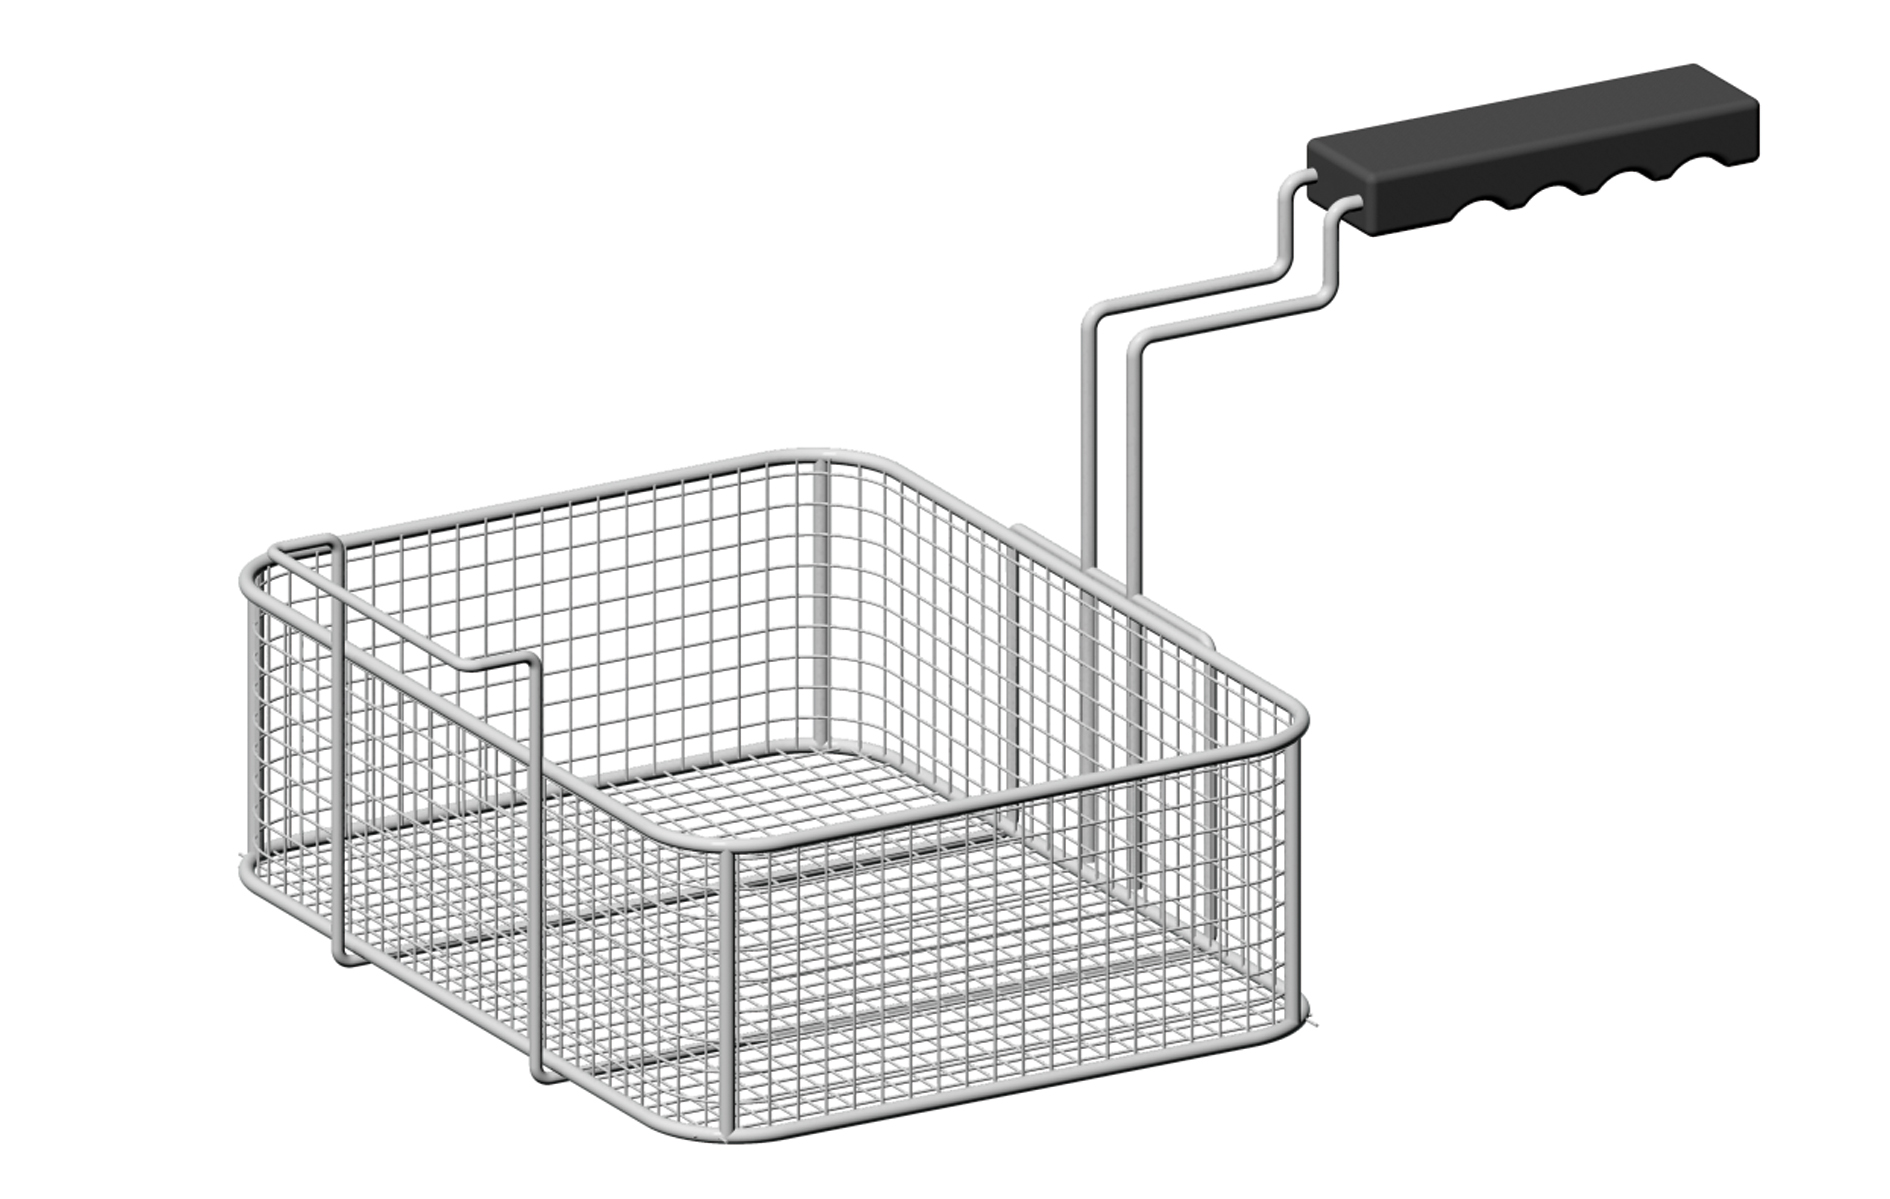 Eurast 63920000 Fryer basket 8 lts. for fryer group 450 bar - 210x232x100 mm